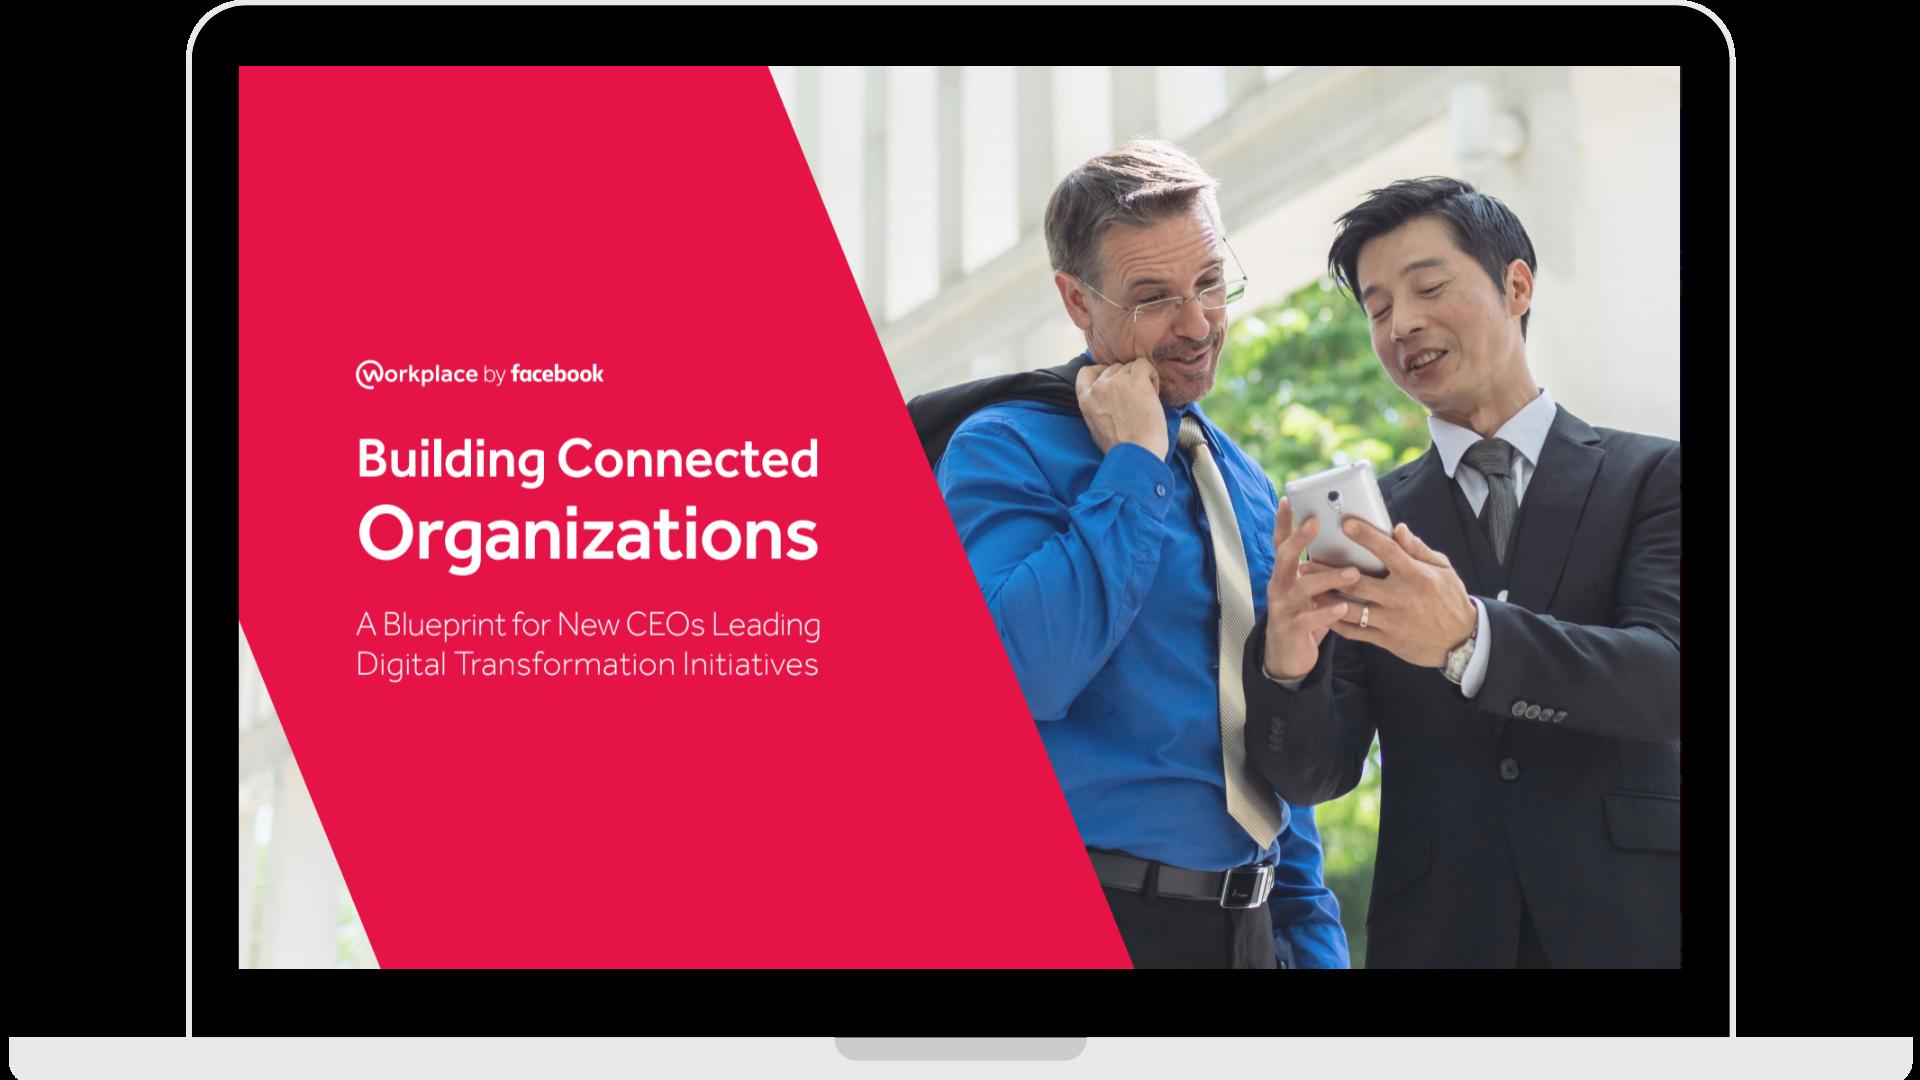 WPF - A Blueprint for New CEOs Leading Digital Transformation Initiatives - Laptop - Transparent